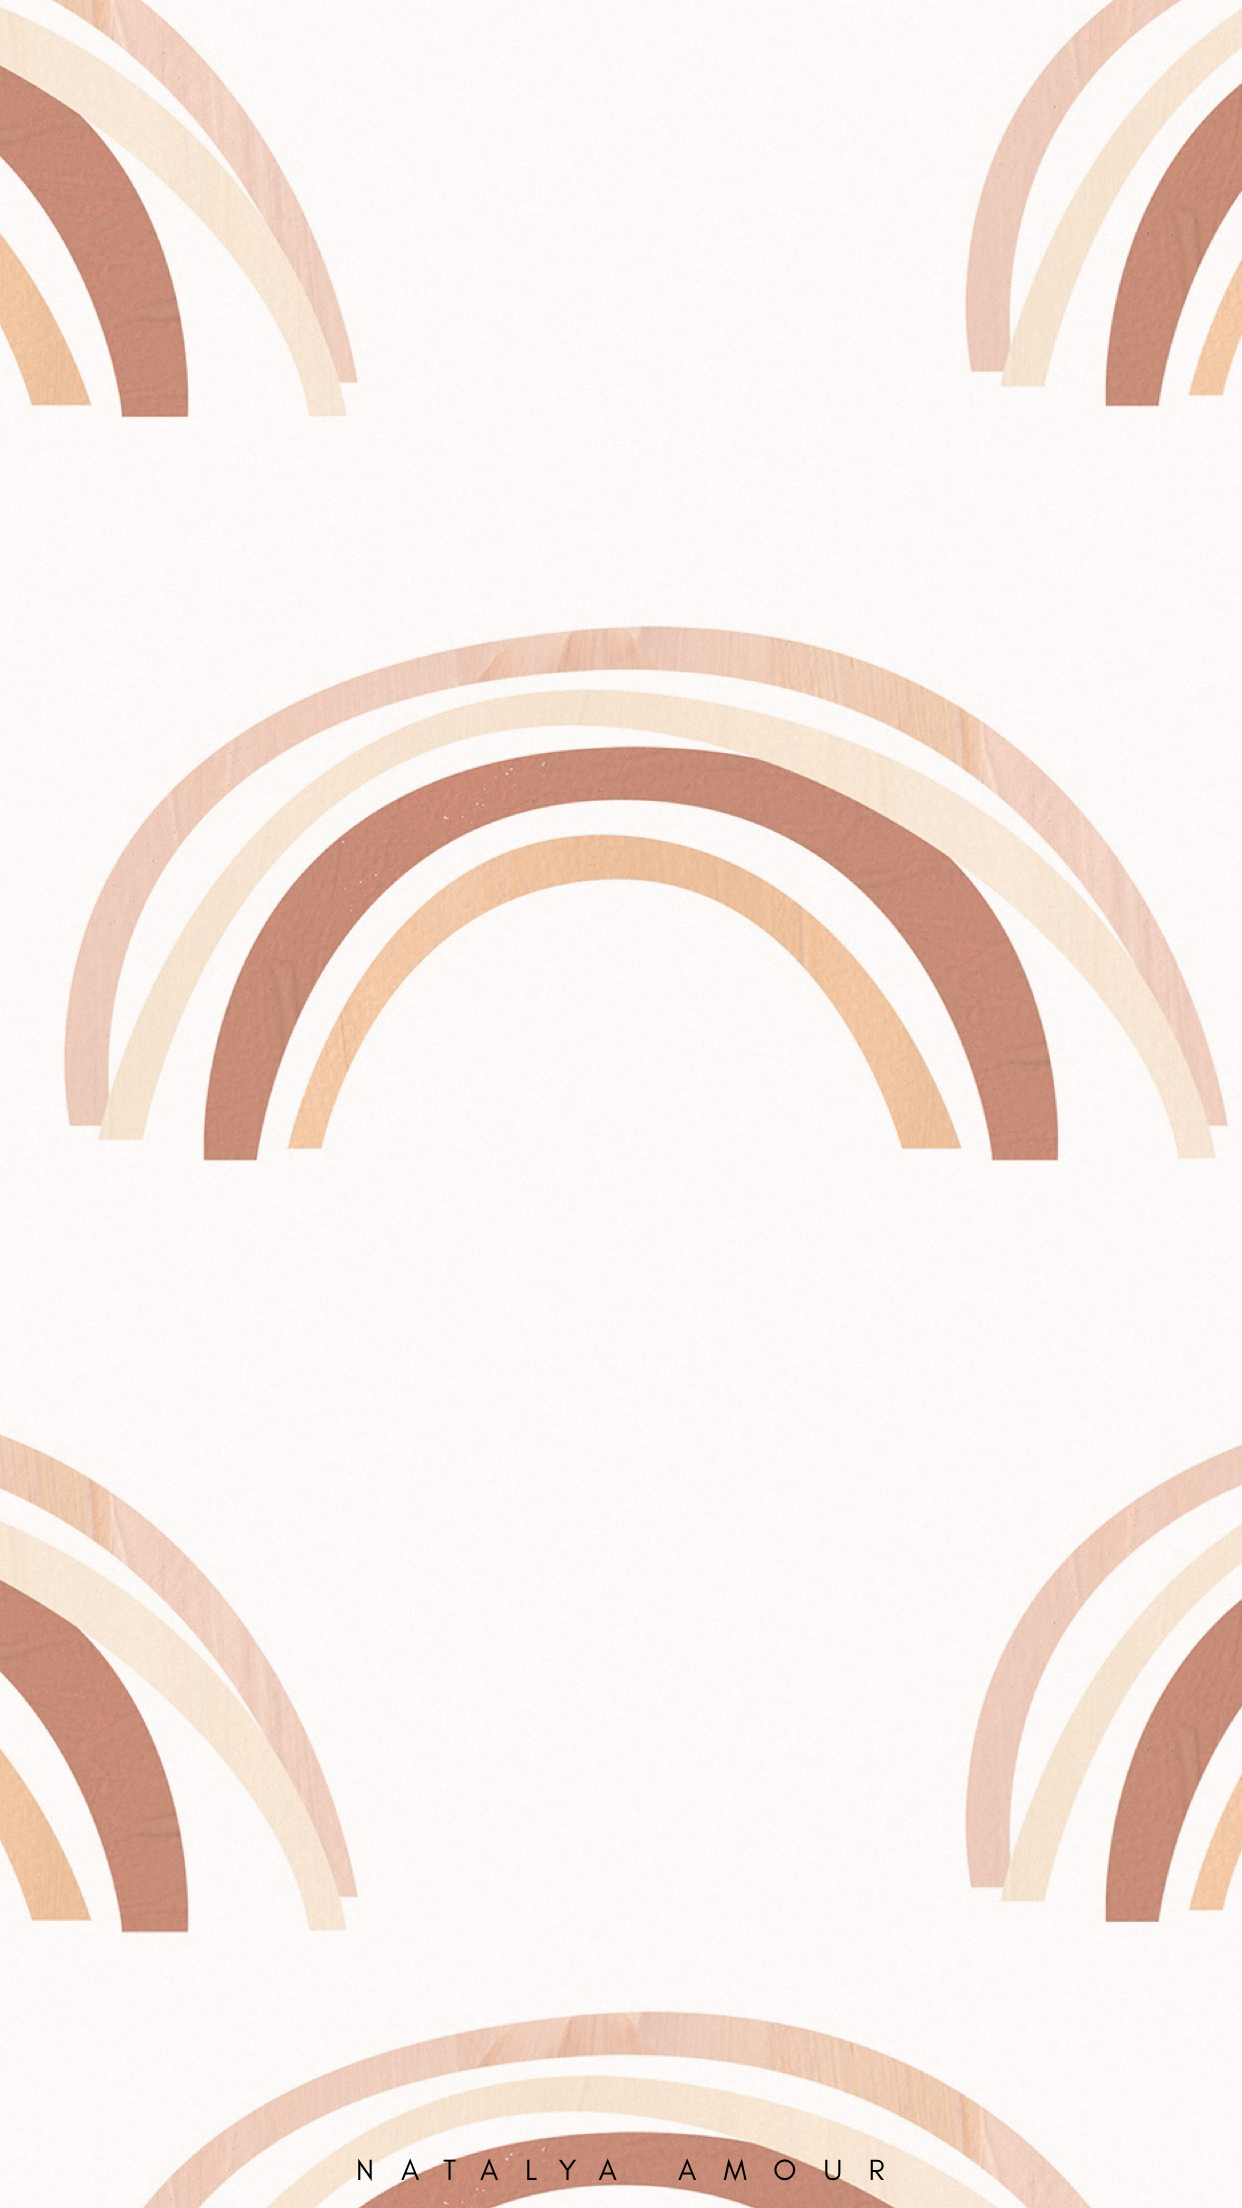 Boho Wallpaper Desktop : wallpaper, desktop, Natalyaamour.com, January, Desktop, Wallpaper, Iphone, Boho,, Wallpaper,, Pastel